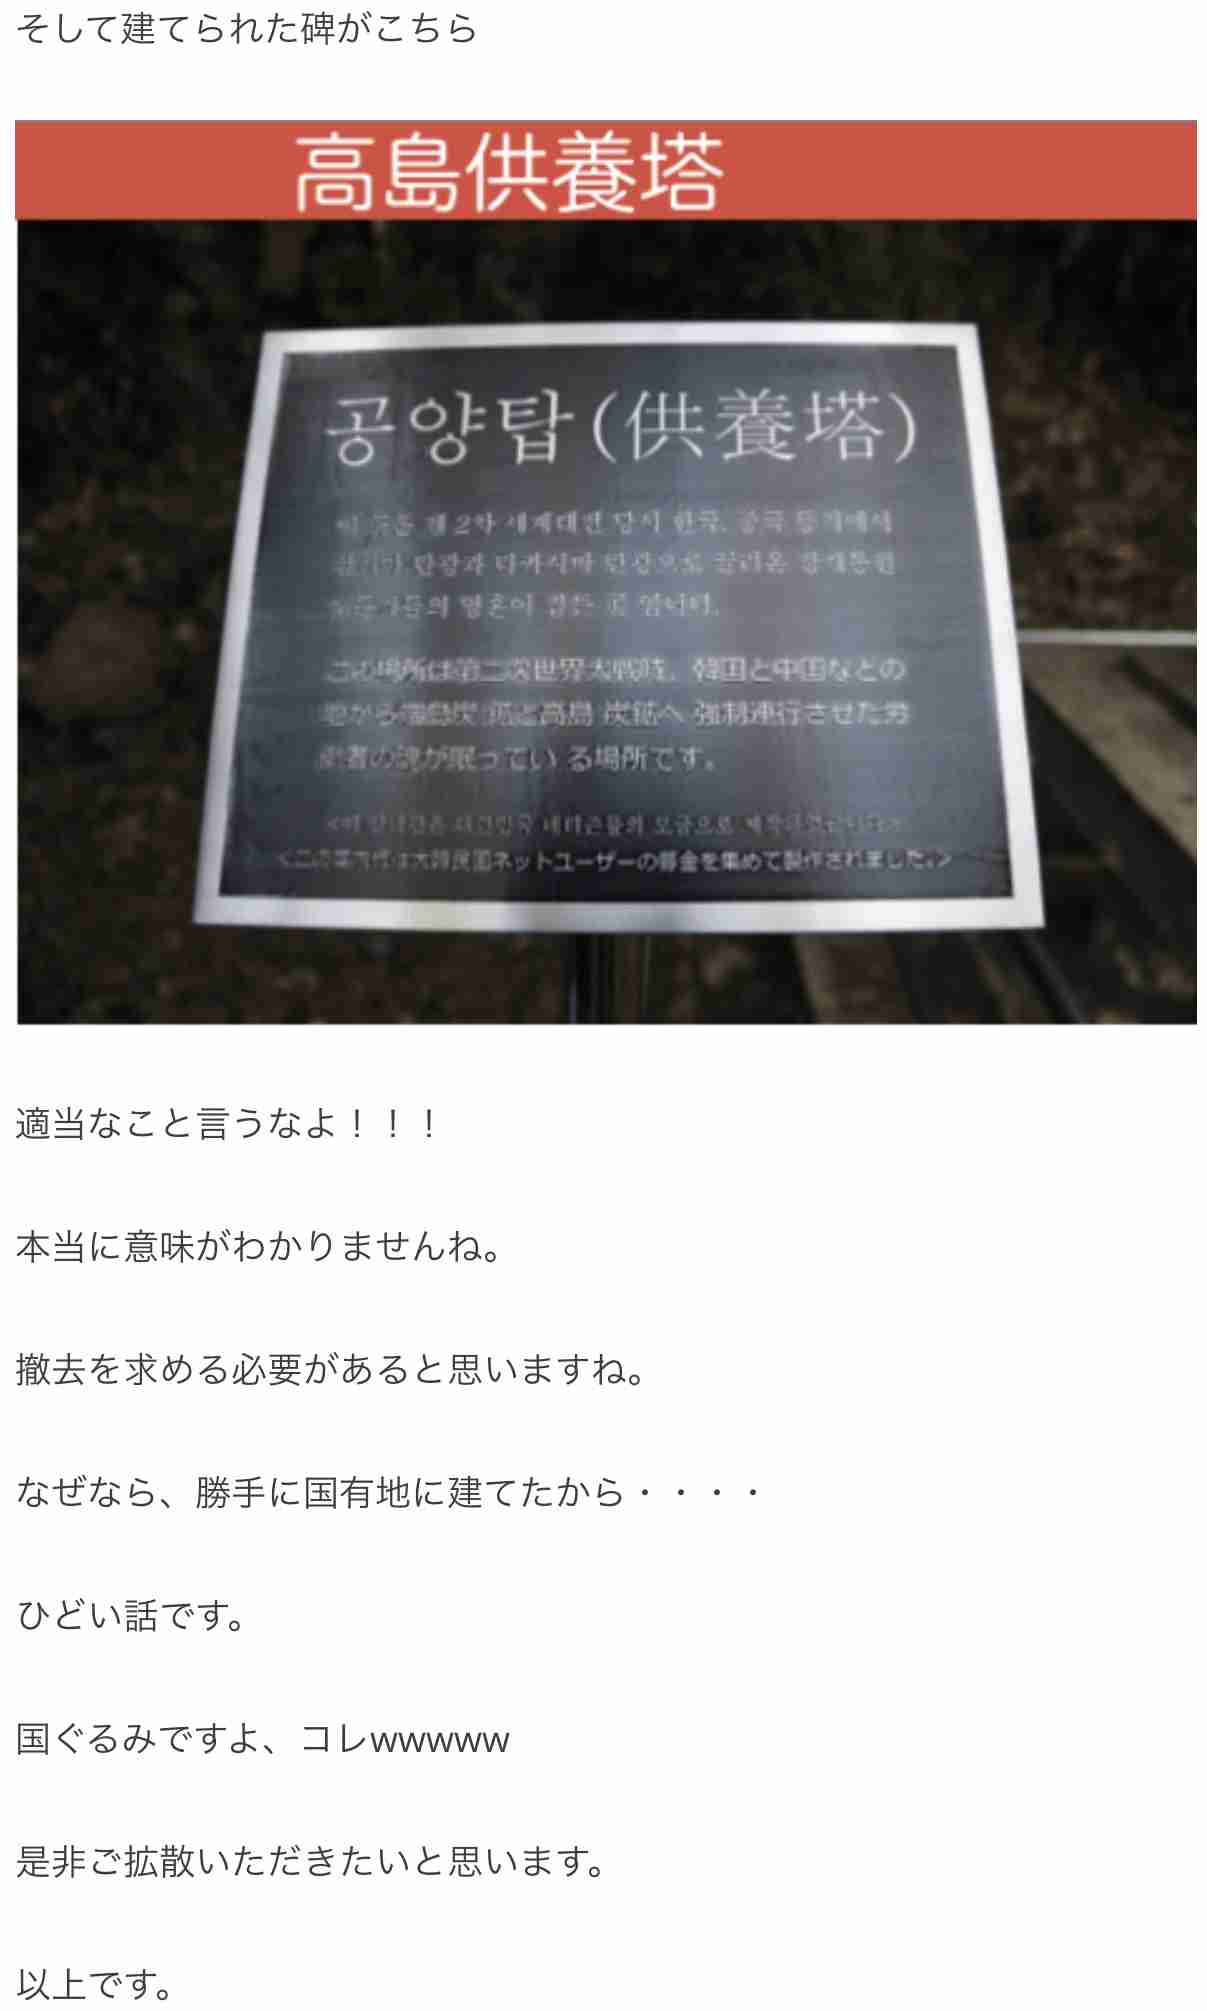 "JAL、""旭日旗デザイン""「機内食の容器を変える」"